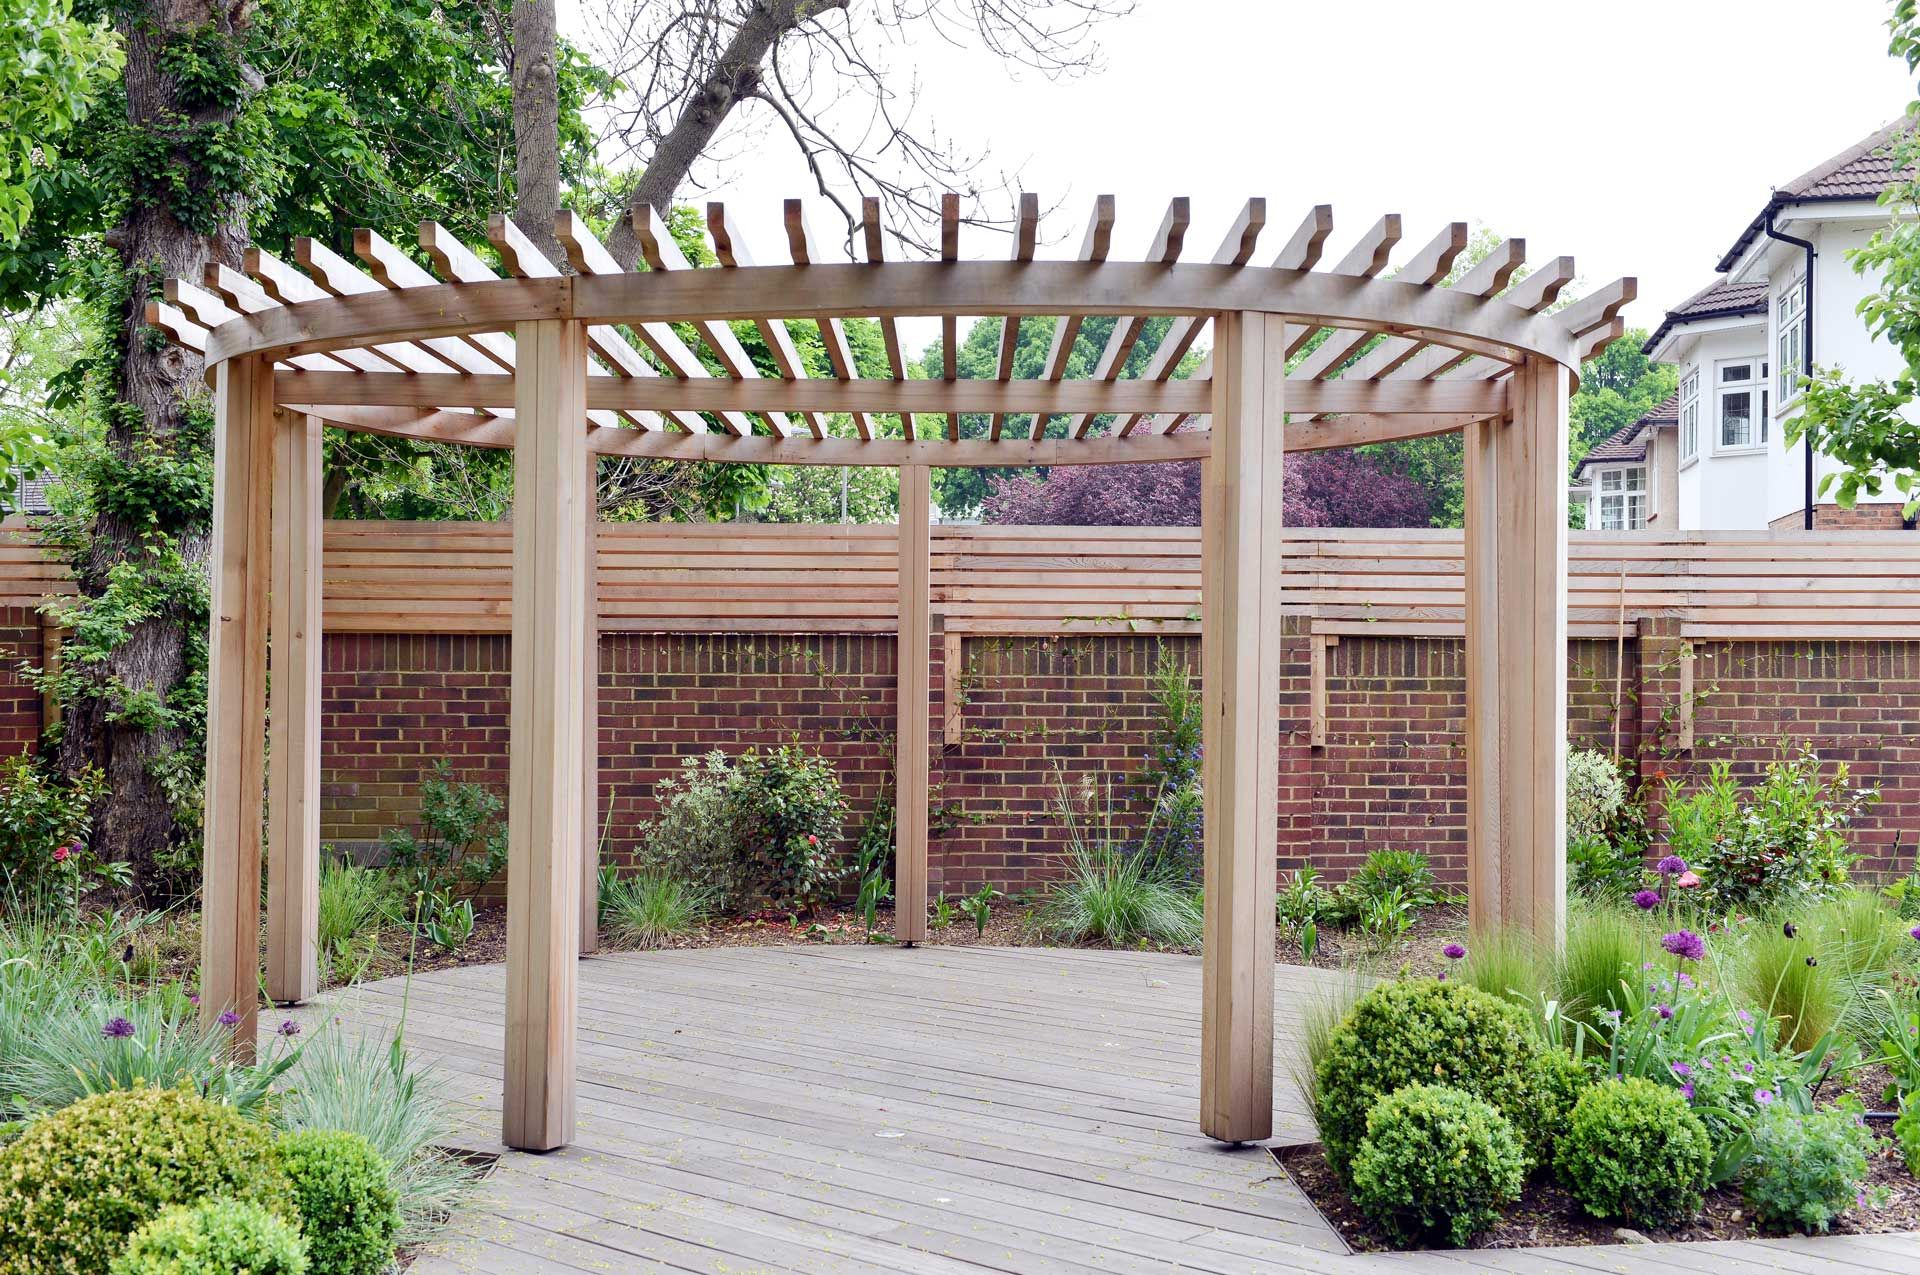 Voile Ombrage Pergola Bois bespoke pergolas & gazebos for your london garden | pergola